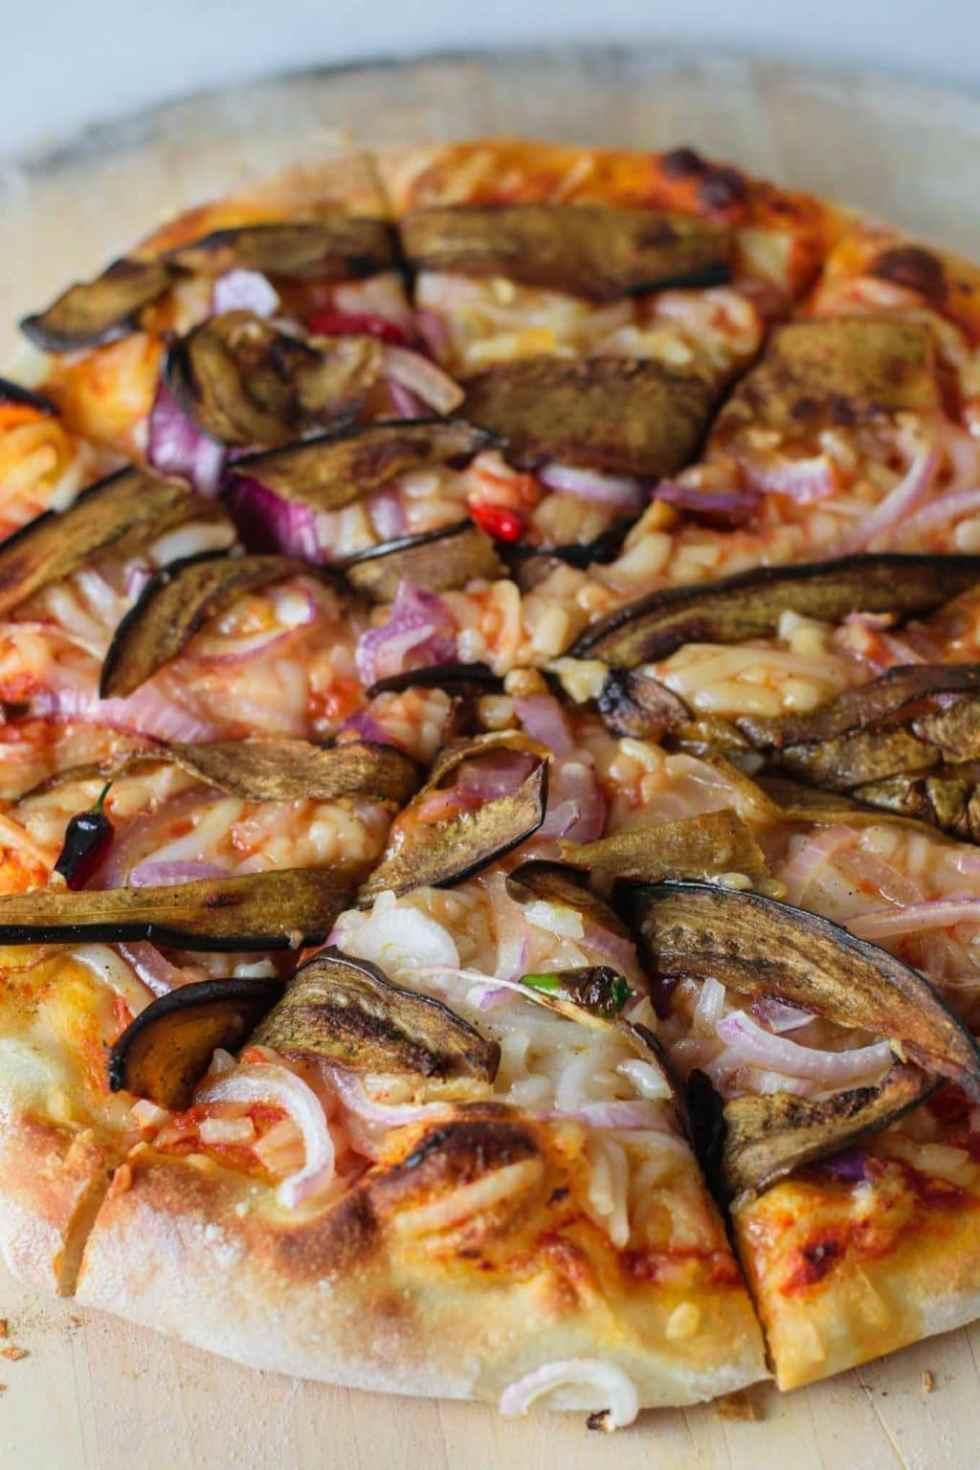 vegan curried eggplant pizza